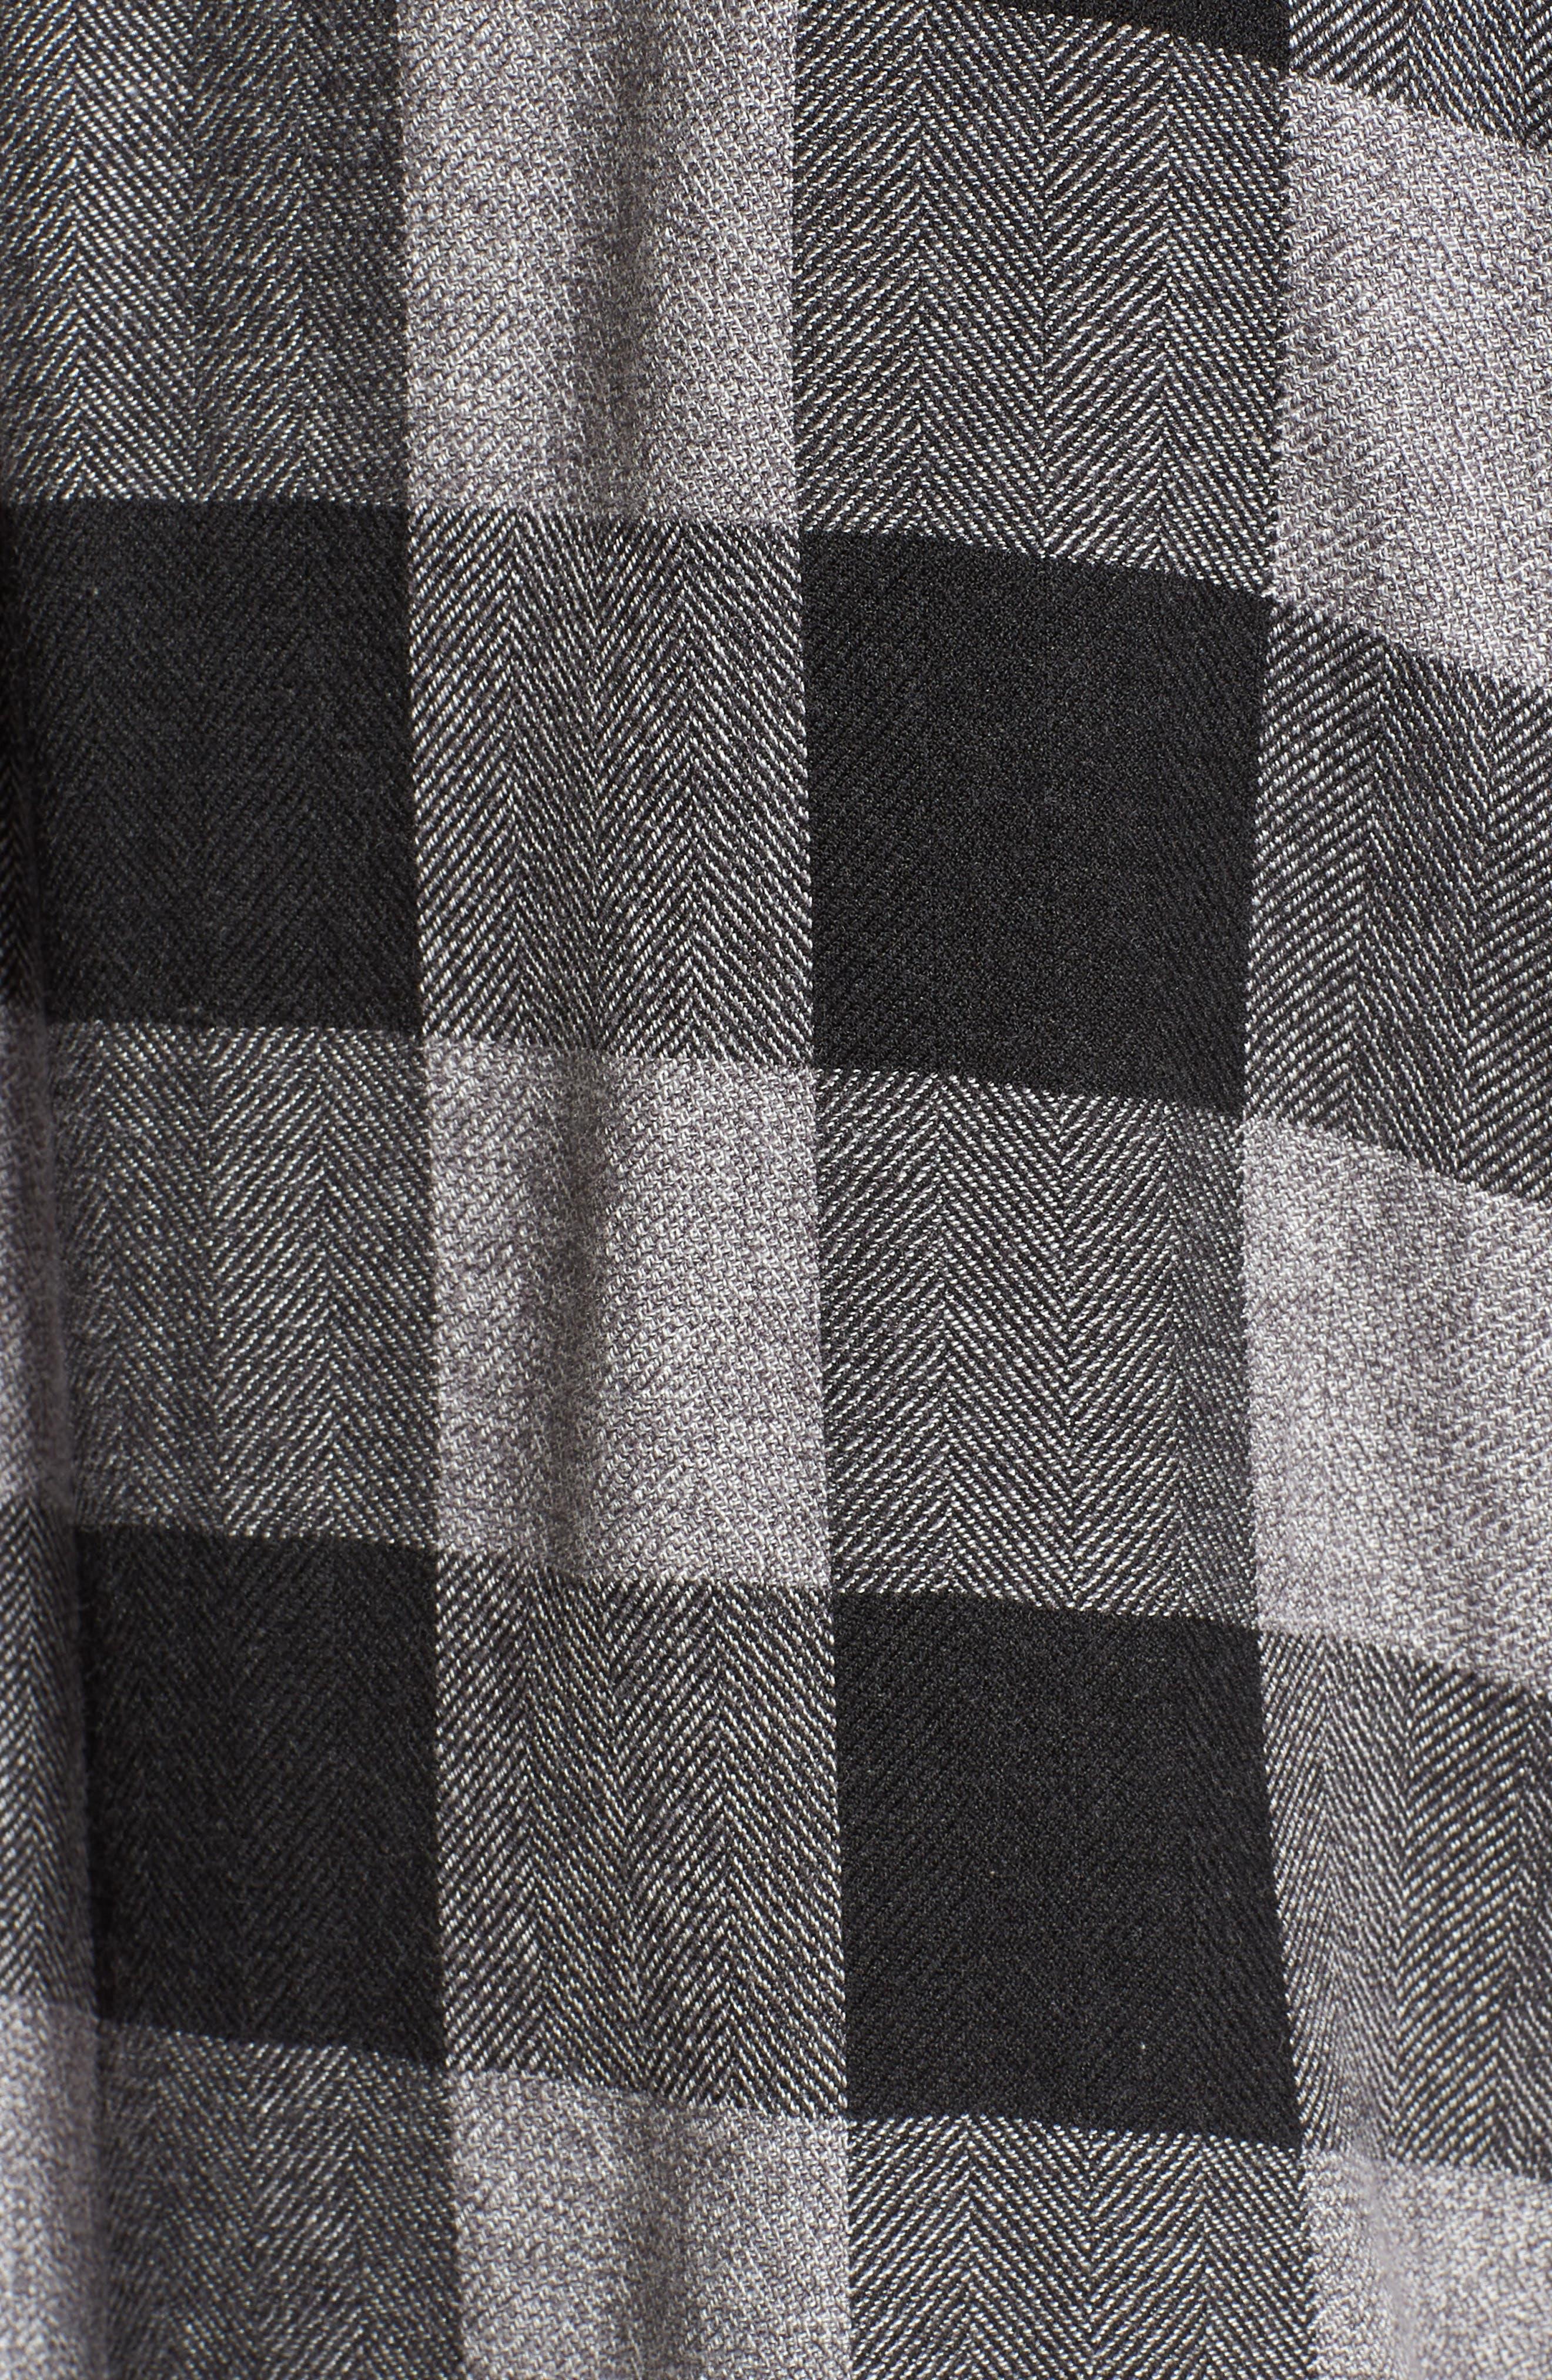 Lennox Sport Shirt,                             Alternate thumbnail 5, color,                             CHARCOAL/ BLACK CHECK